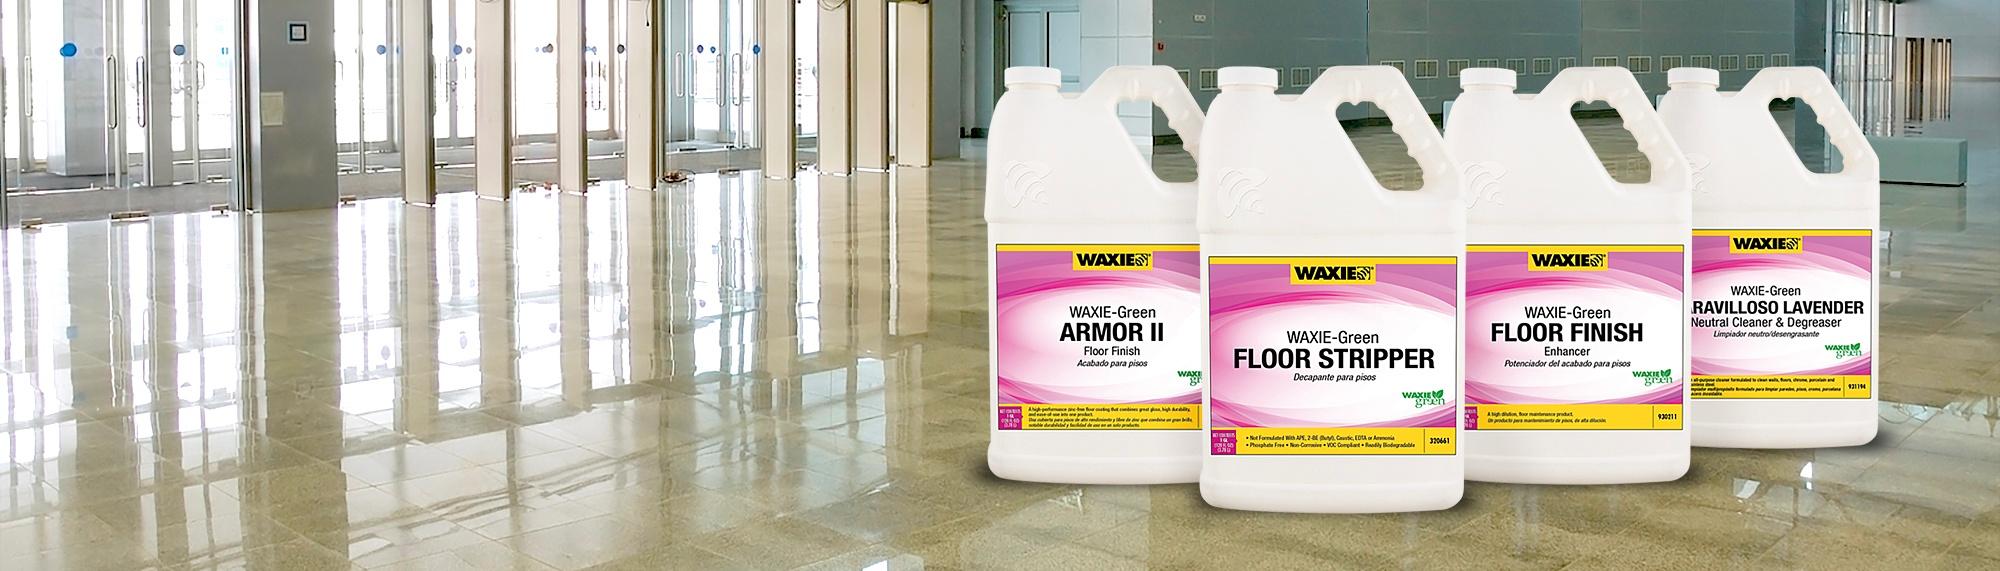 wg-floorcare-system.jpg